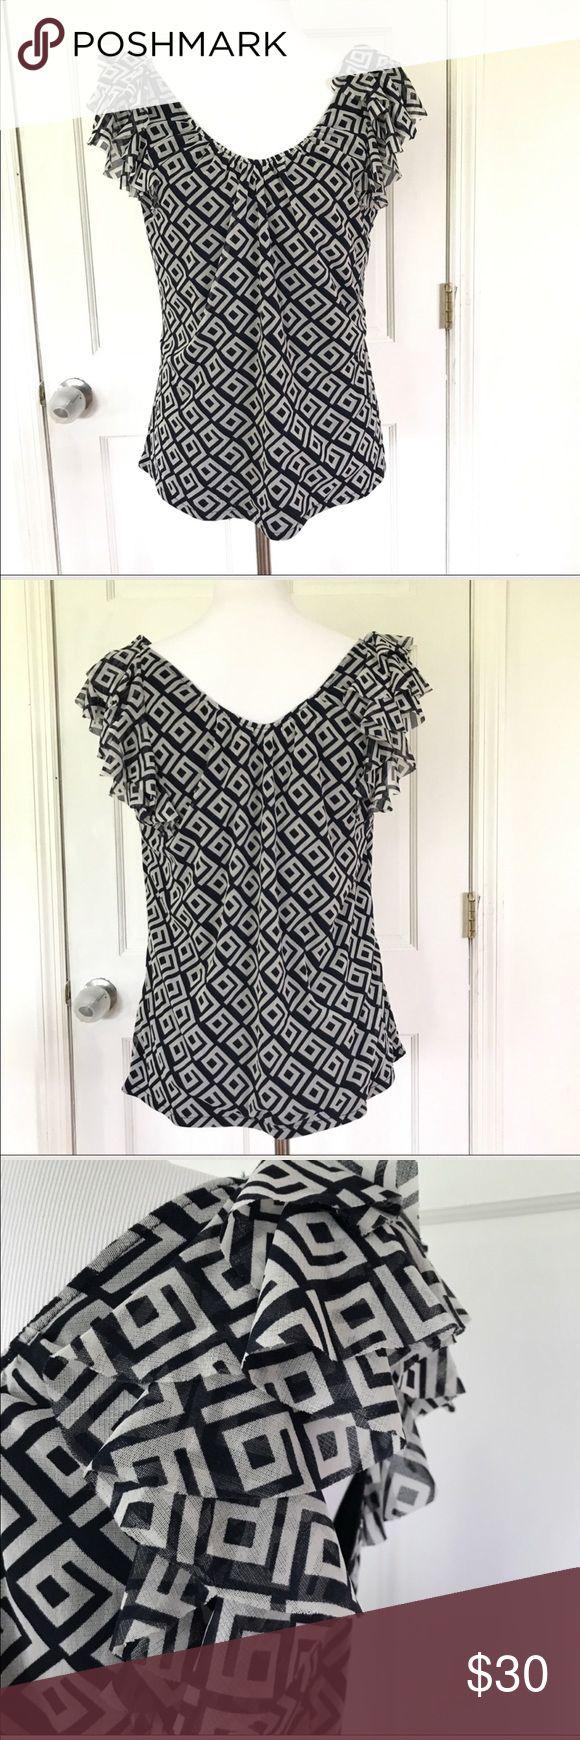 Blue and white ruffle sleeve INC shirt Super cute gauzy INC international concepts ruffle sleeve top. Lightweight & comfortable. Size large. INC International Concepts Tops Tees - Short Sleeve